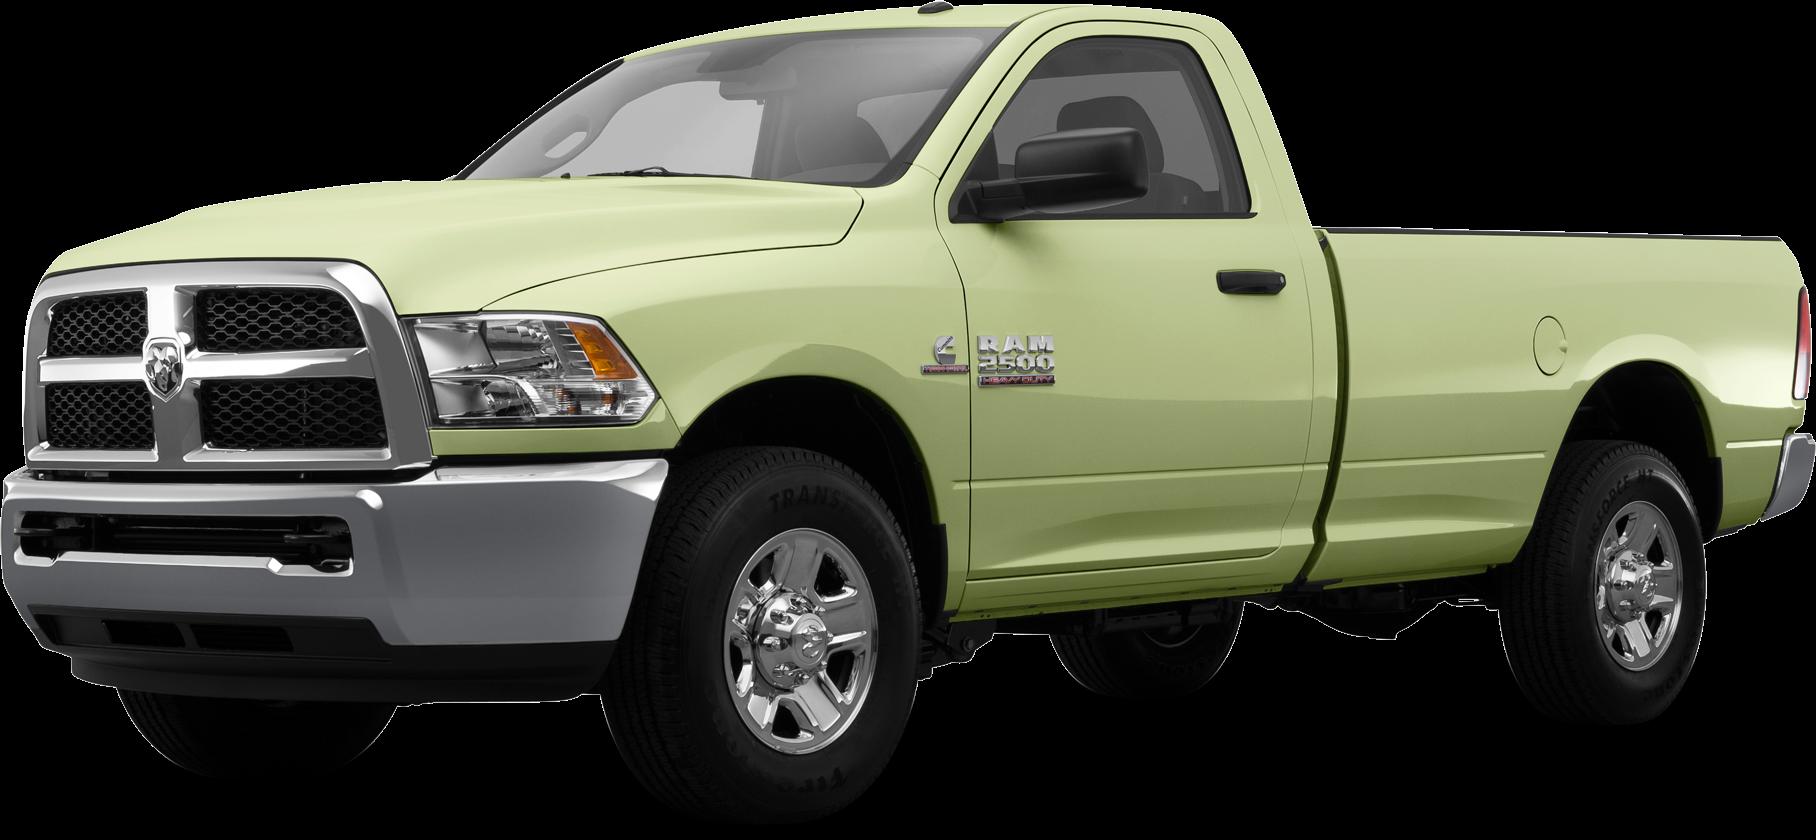 2014 GMC Sierra 3500 HD Crew Cab | Pricing, Ratings, Expert